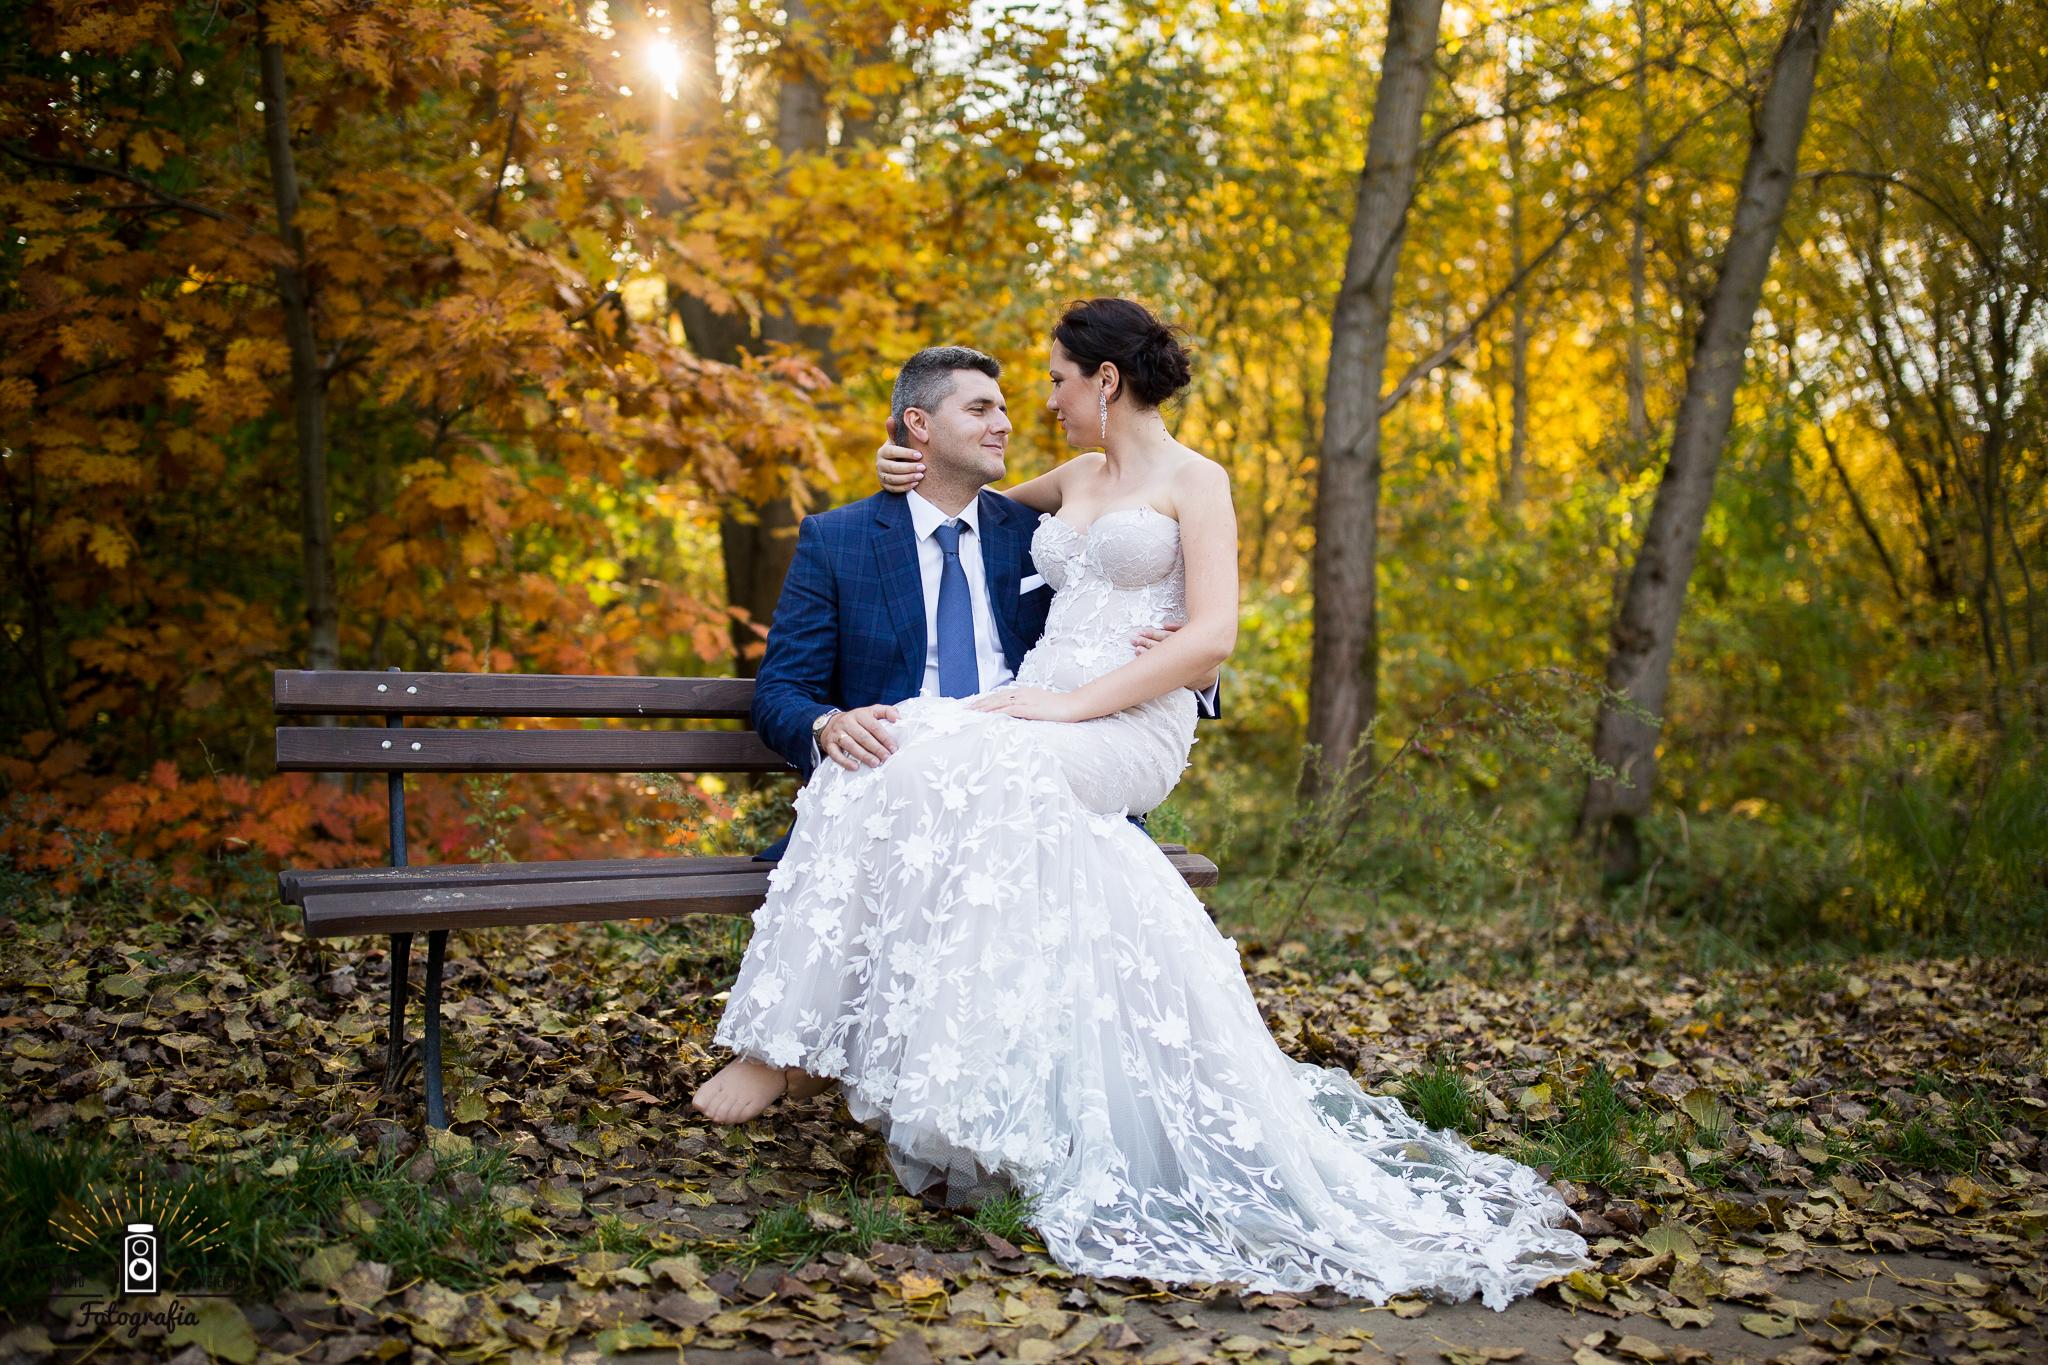 Beata i Bartek ślubnie